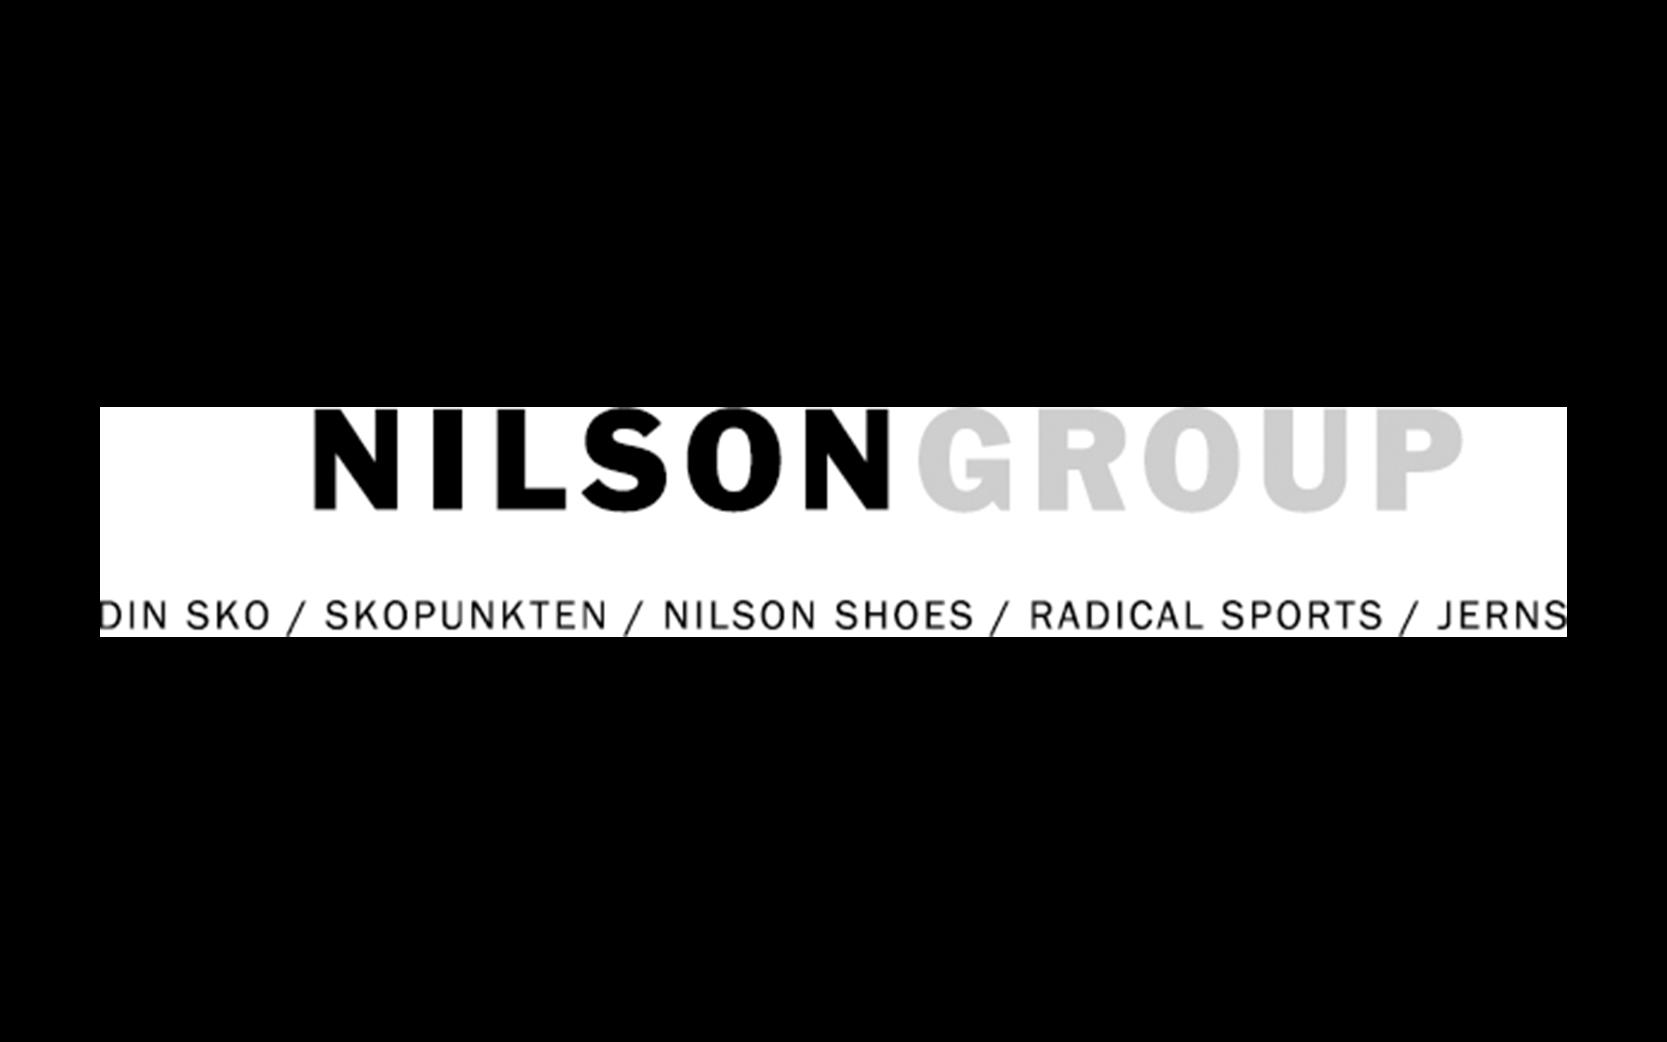 Nilson Groups logotyp